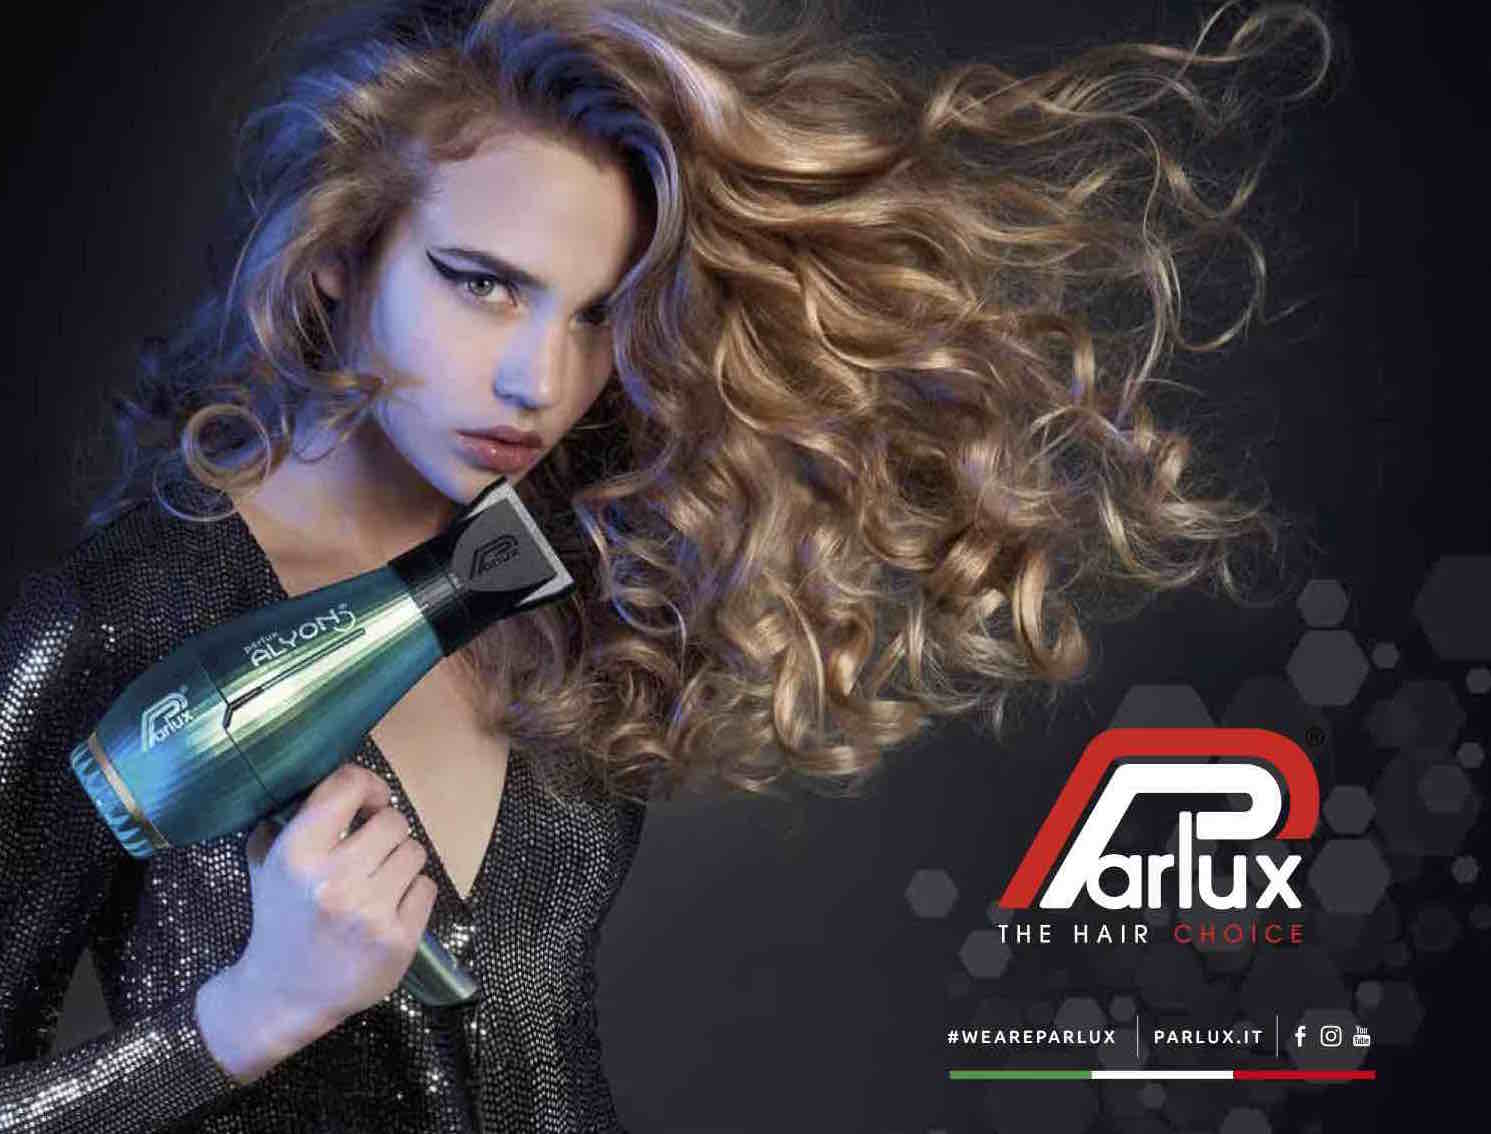 Catalogo Parlux 2019 PR231 low copia 2